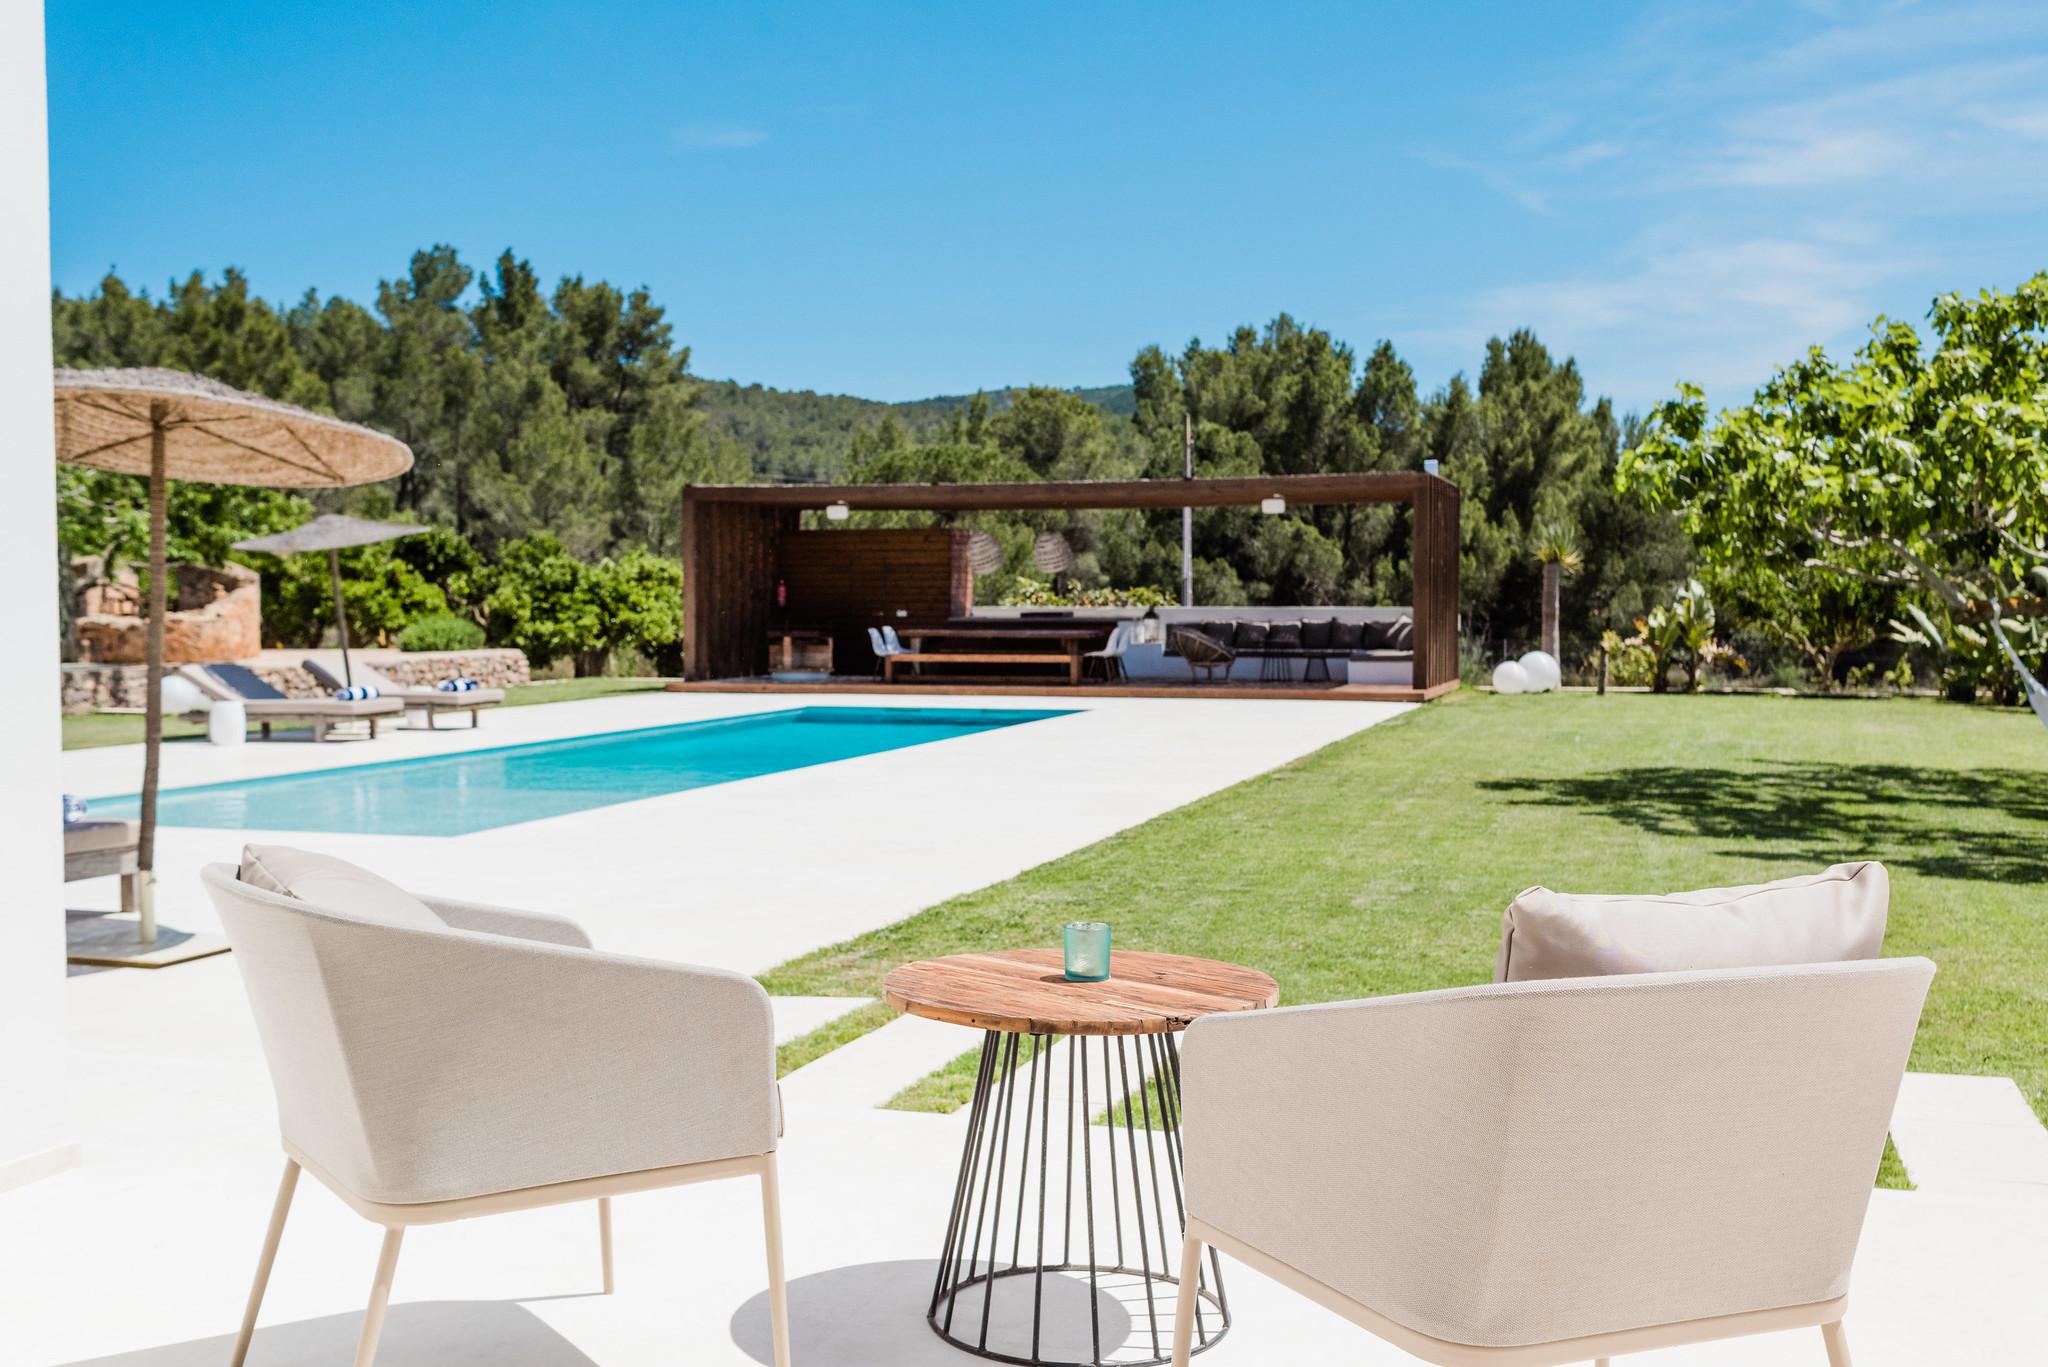 https://www.white-ibiza.com/wp-content/uploads/2020/06/white-ibiza-villas-can-carmen-exterior-pool3.jpg